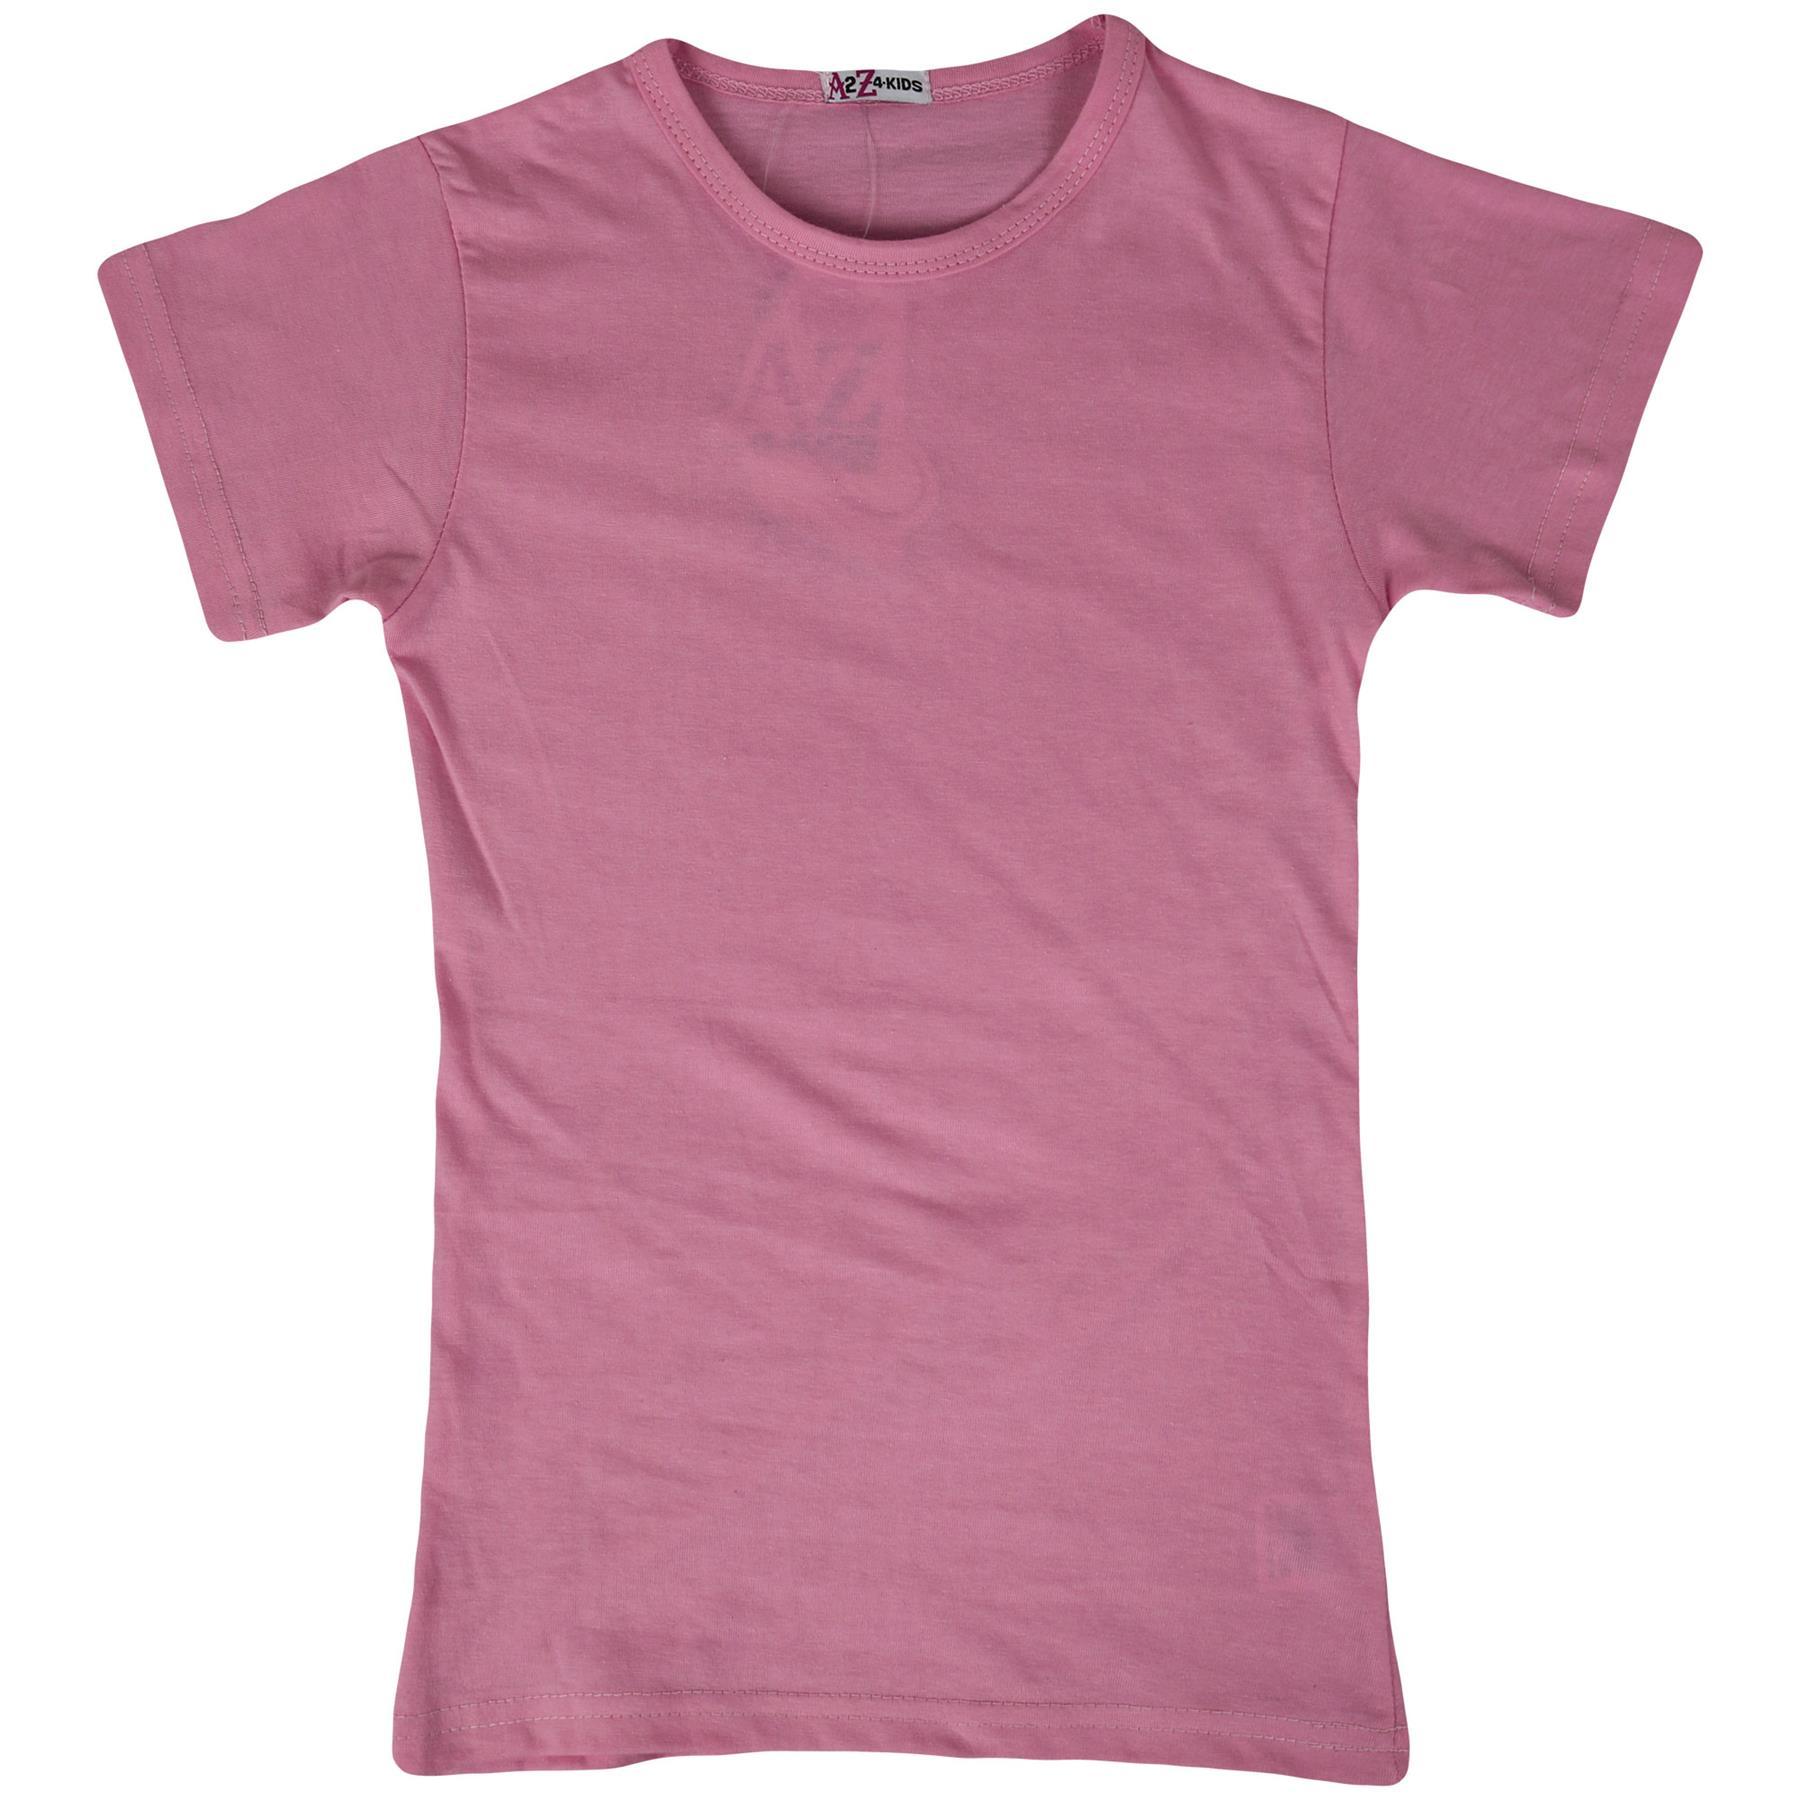 Kids-Girls-T-Shirts-Designer-100-Cotton-Plain-School-T-Shirt-Top-New-Age-3-13Yr thumbnail 5